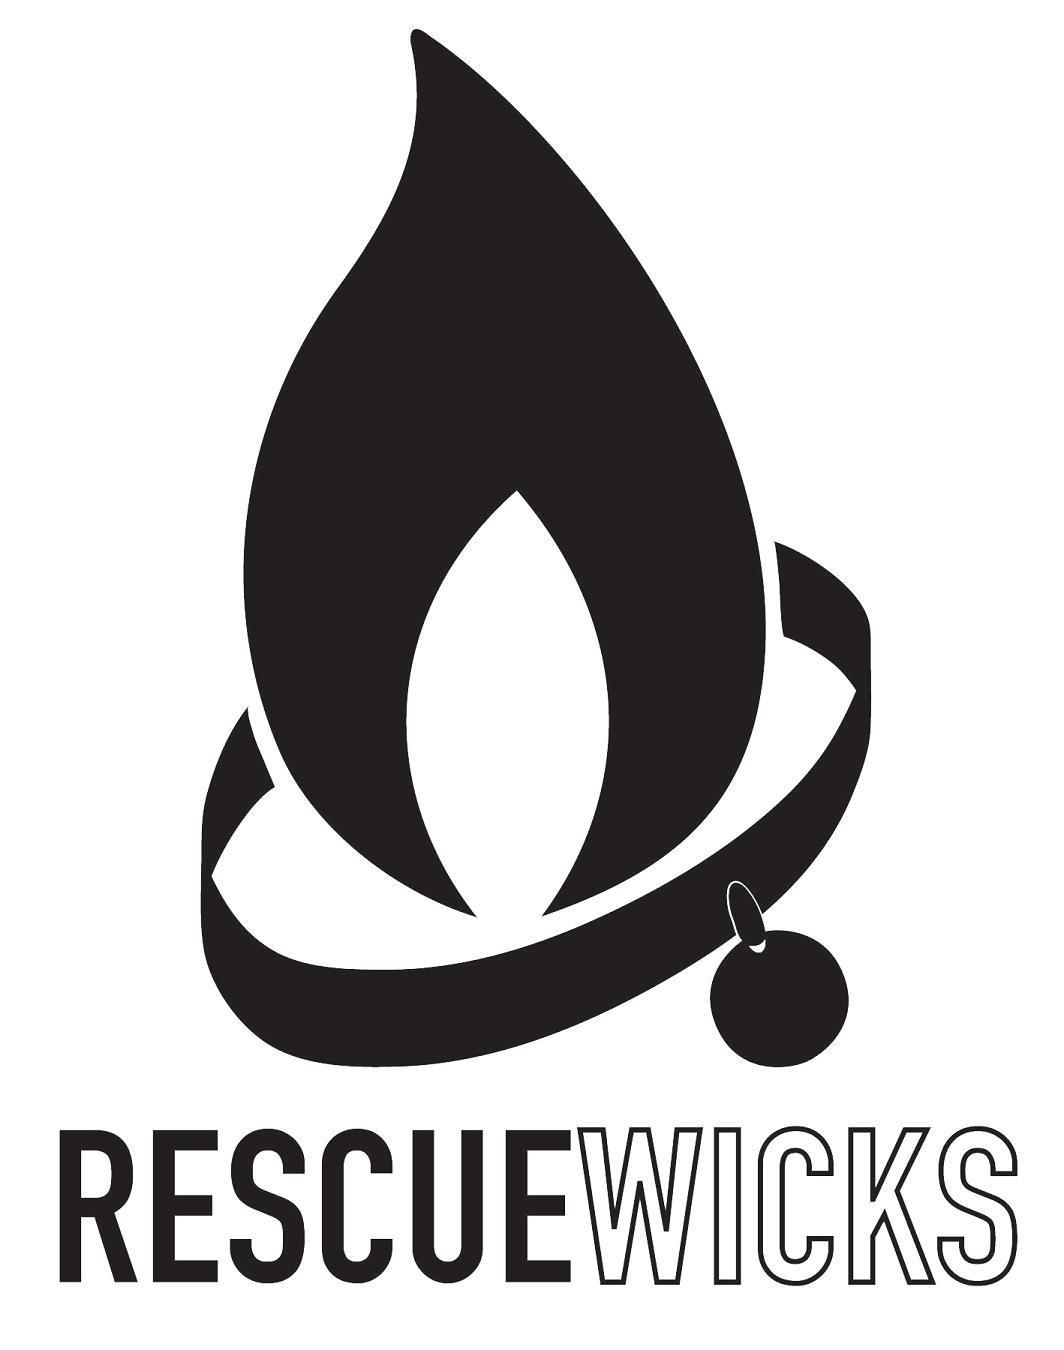 Rescuewicks